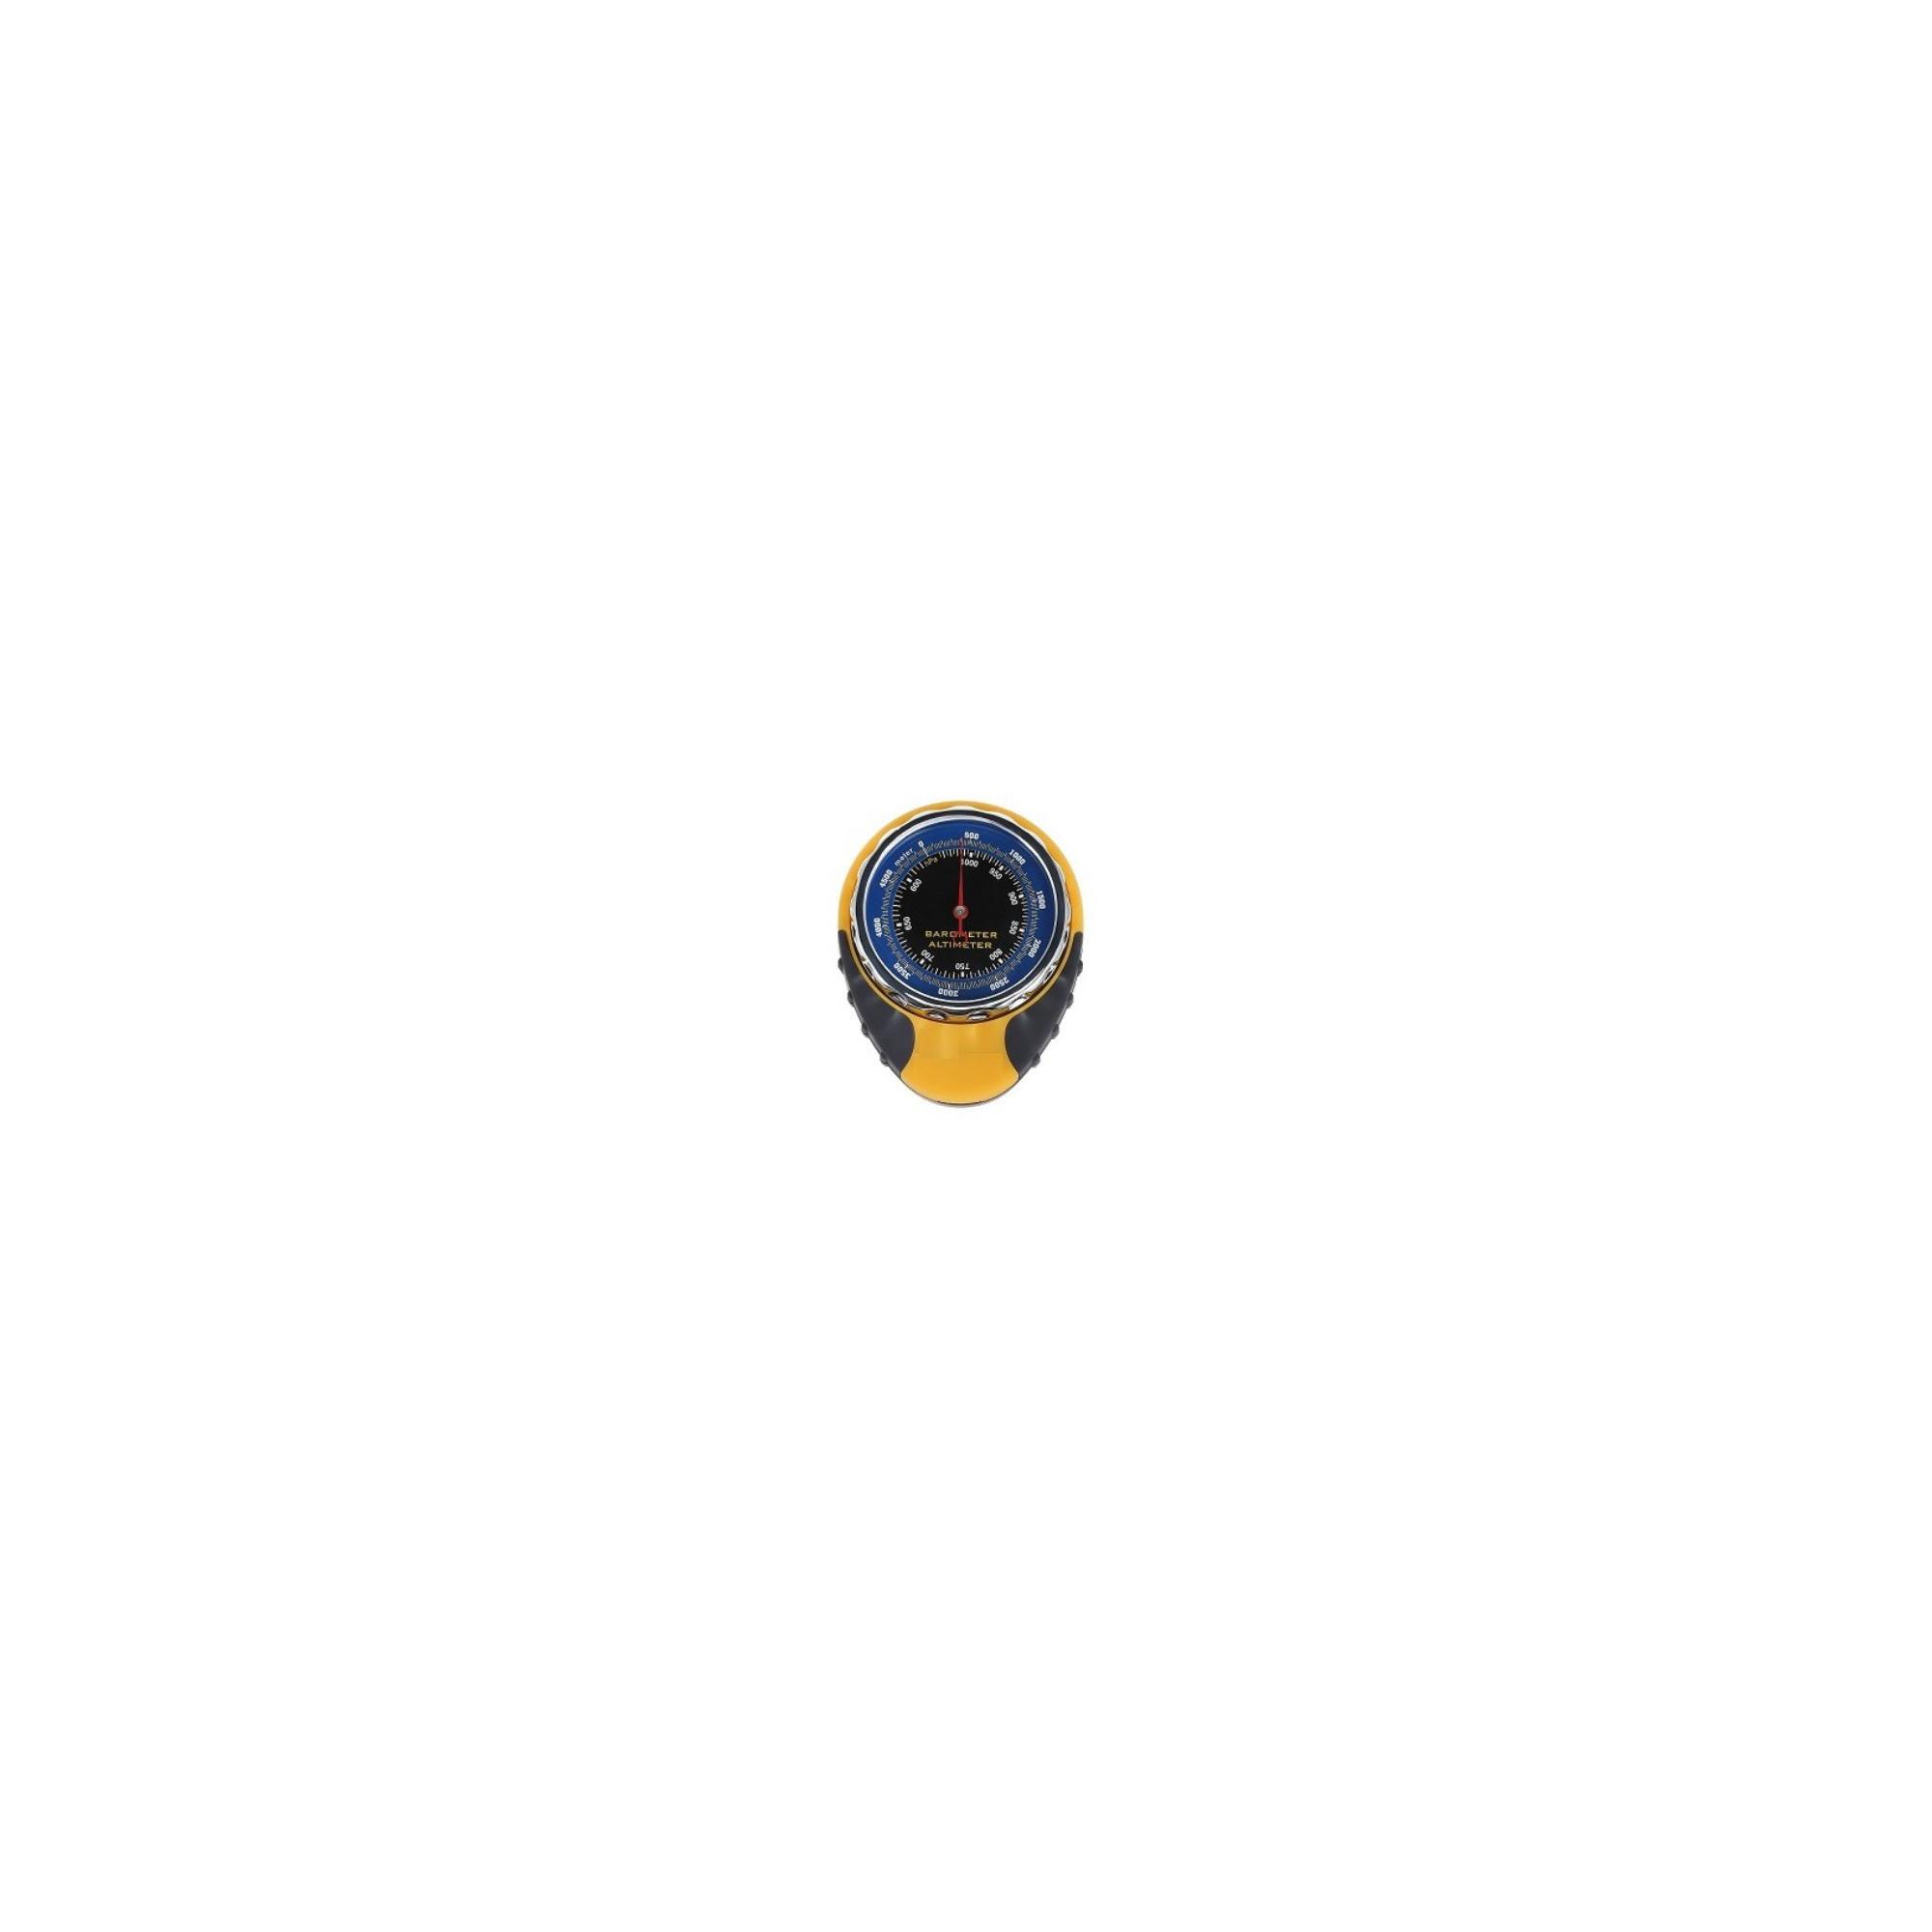 ALTÍMETRO 0 - 5000 M